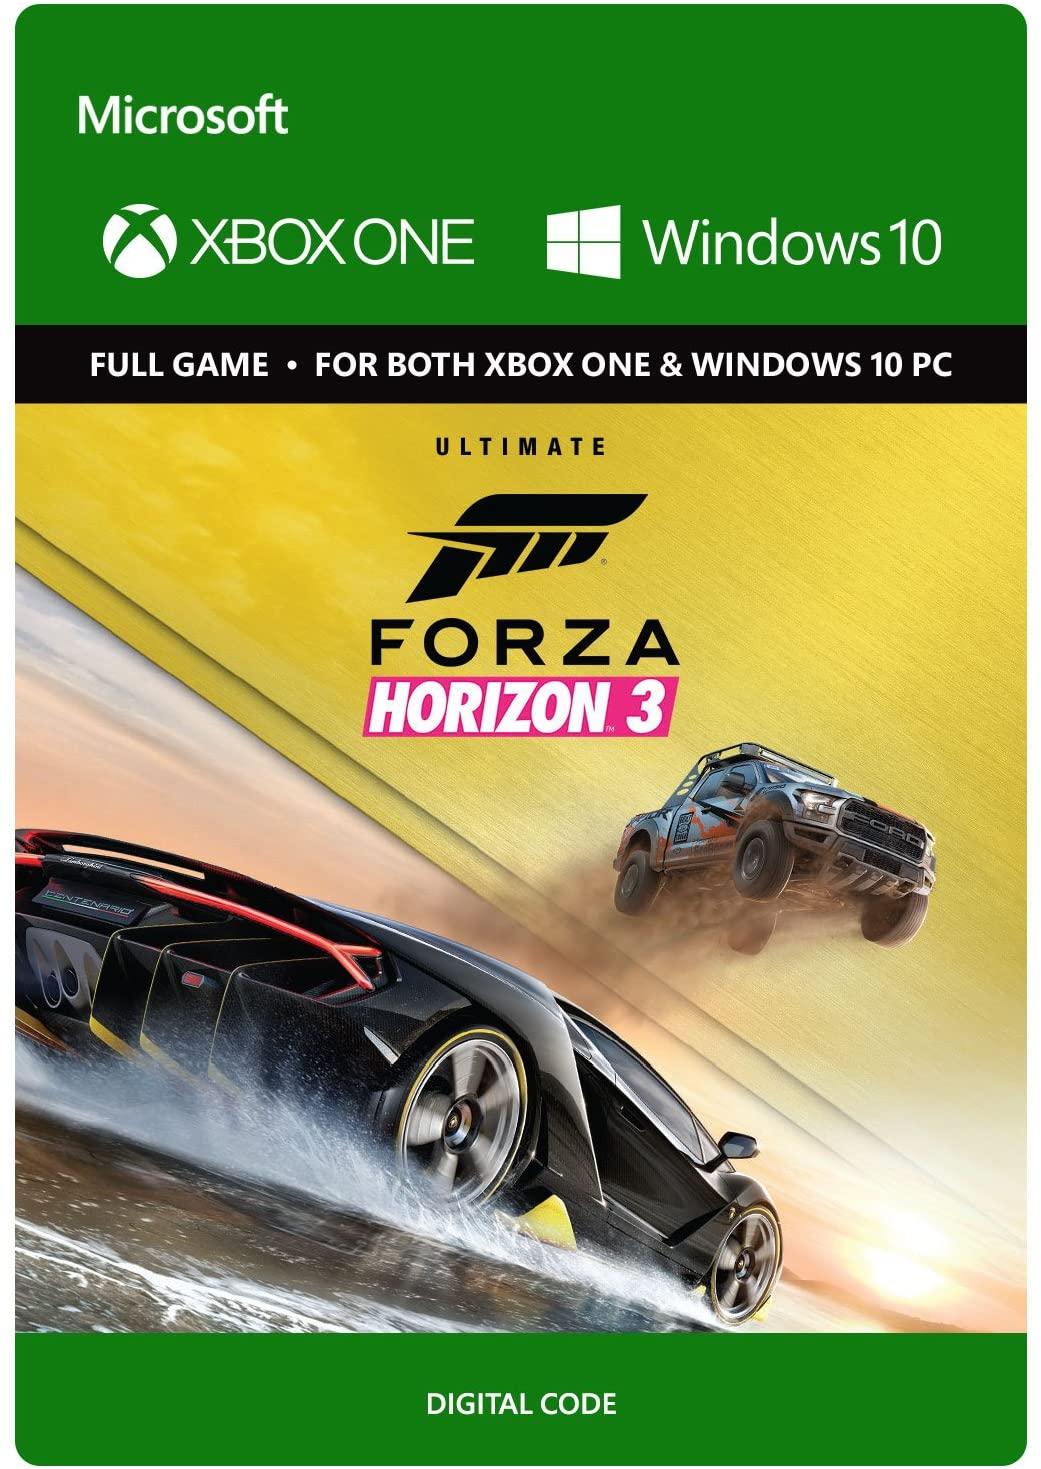 (Xbox, PC) Forza Horizon 3 Ultimate Edition £17.99 at Microsoft